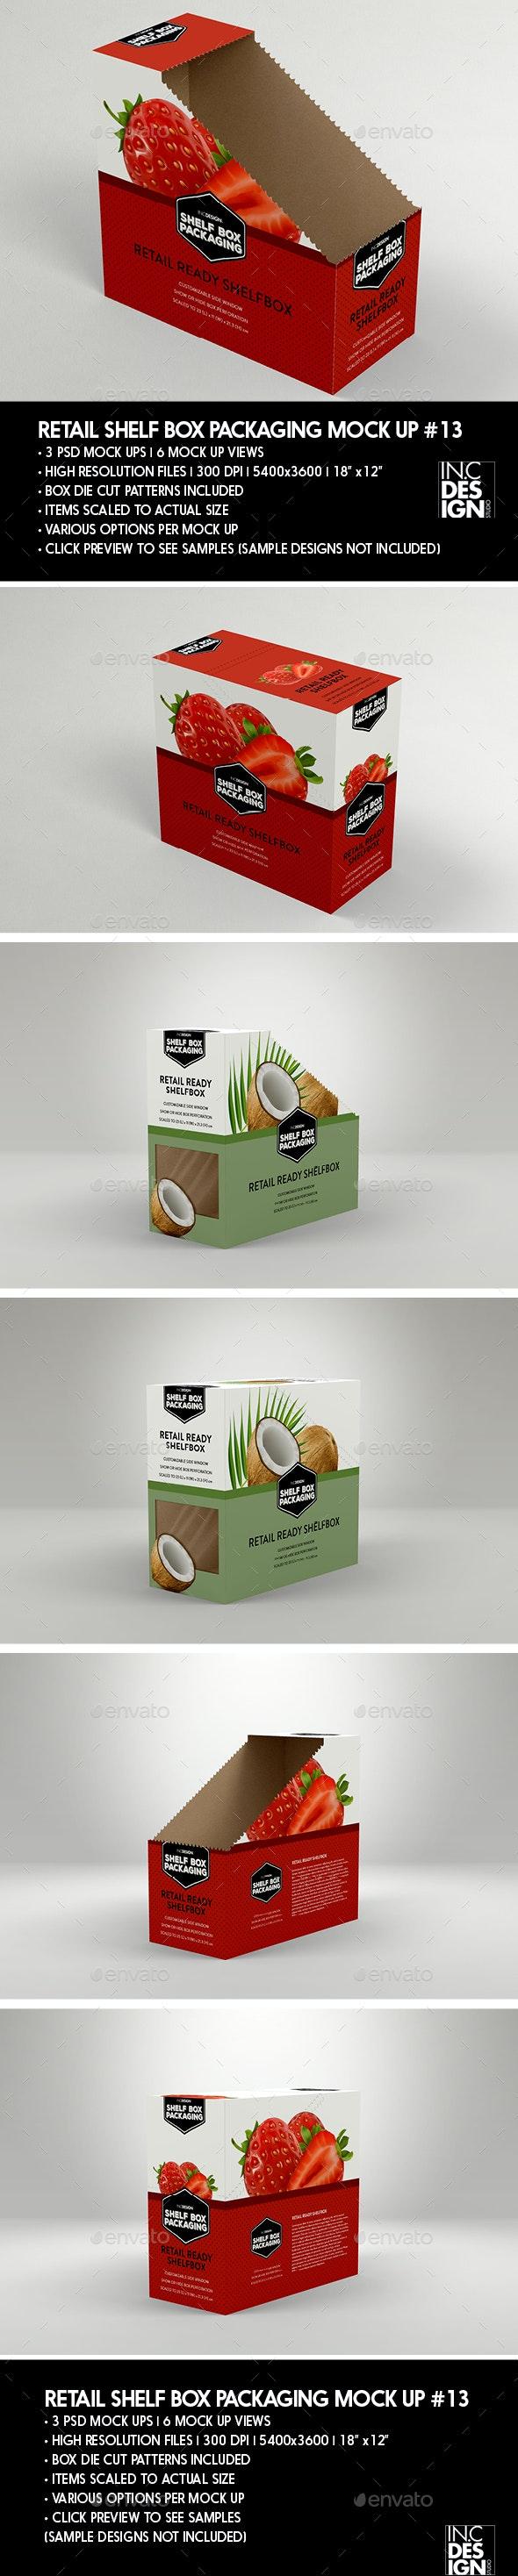 Retail Shelf Box Packaging MockUp No.13 - Packaging Product Mock-Ups